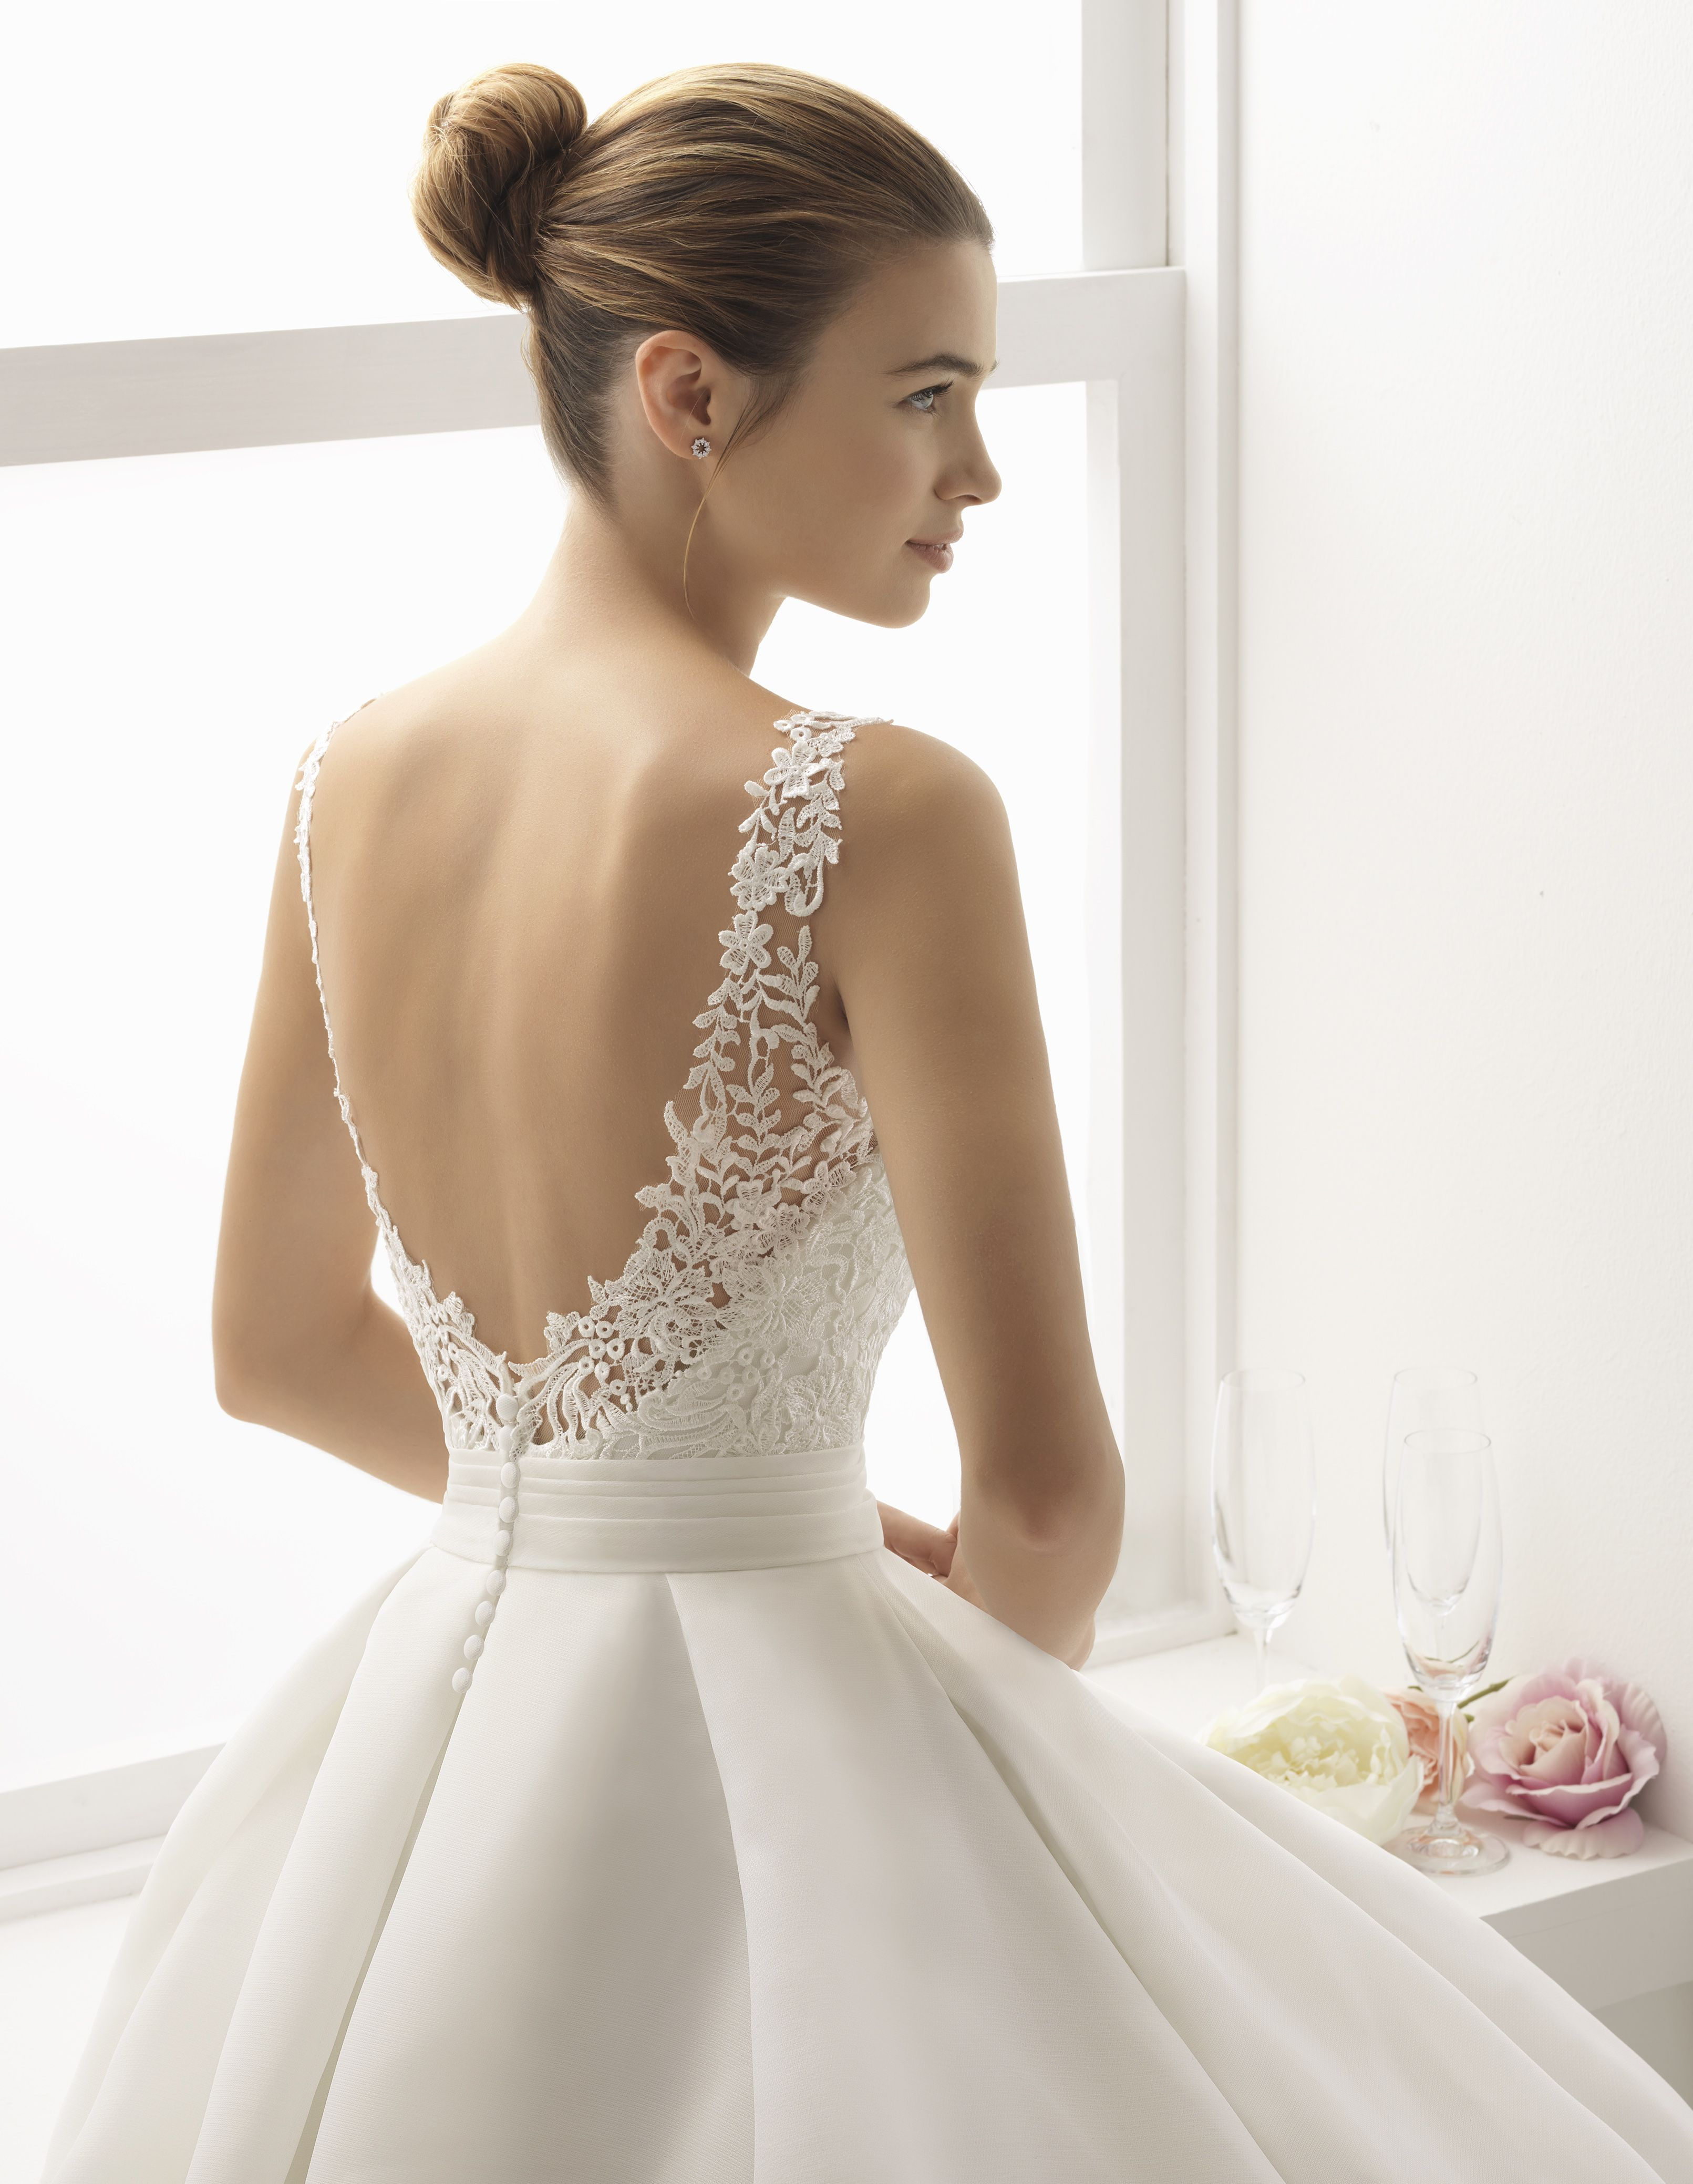 ab9036f19d2 Robe Bitacora  collection 2018  airebarcelona !  robesdemariee  robes   wedding  weddingdress  dress  bridal  mariée  mariage